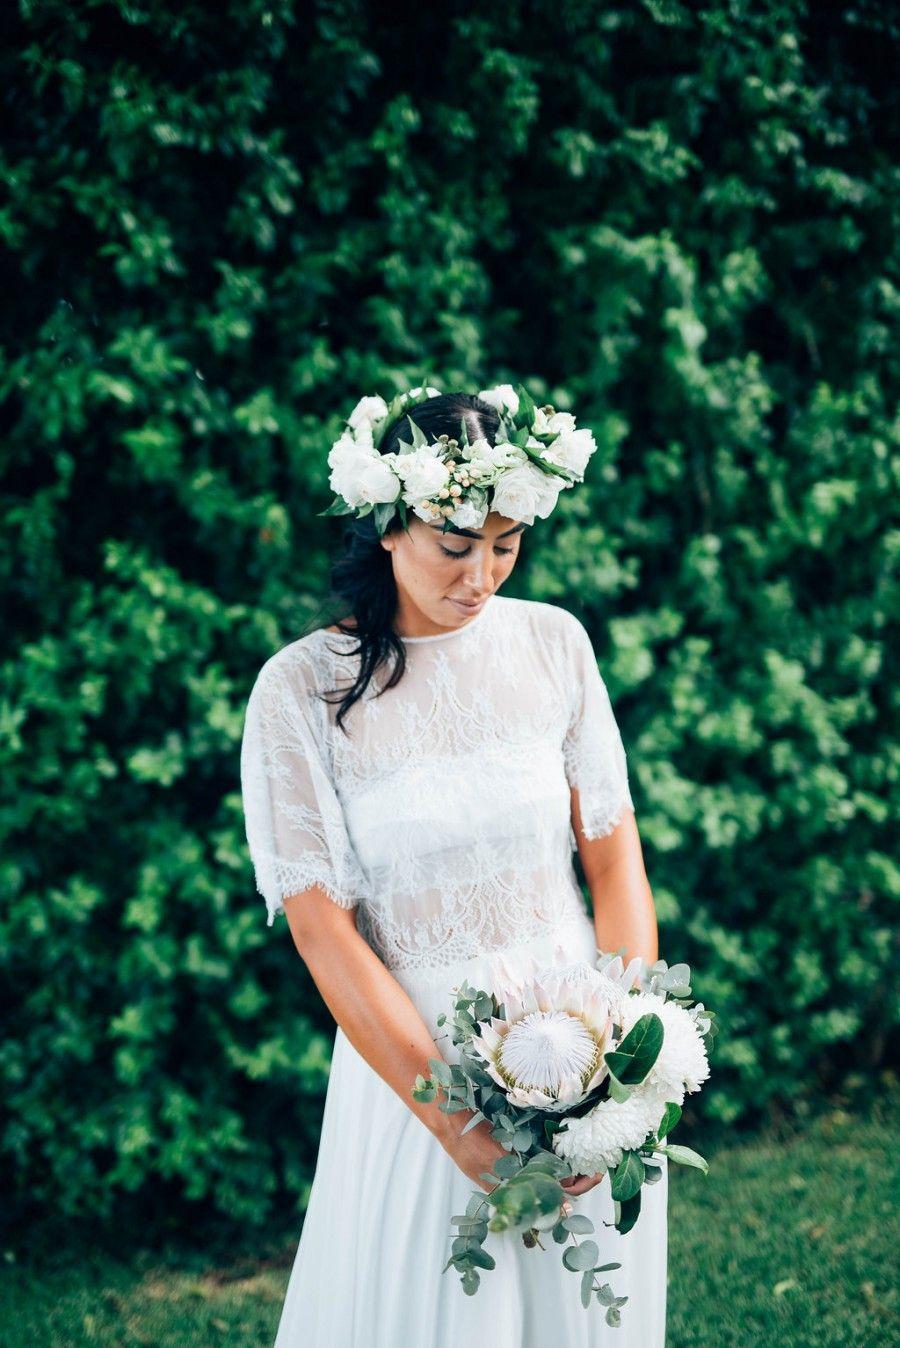 Leah & Jim's Byron View Farm Wedding Wedding dresses for